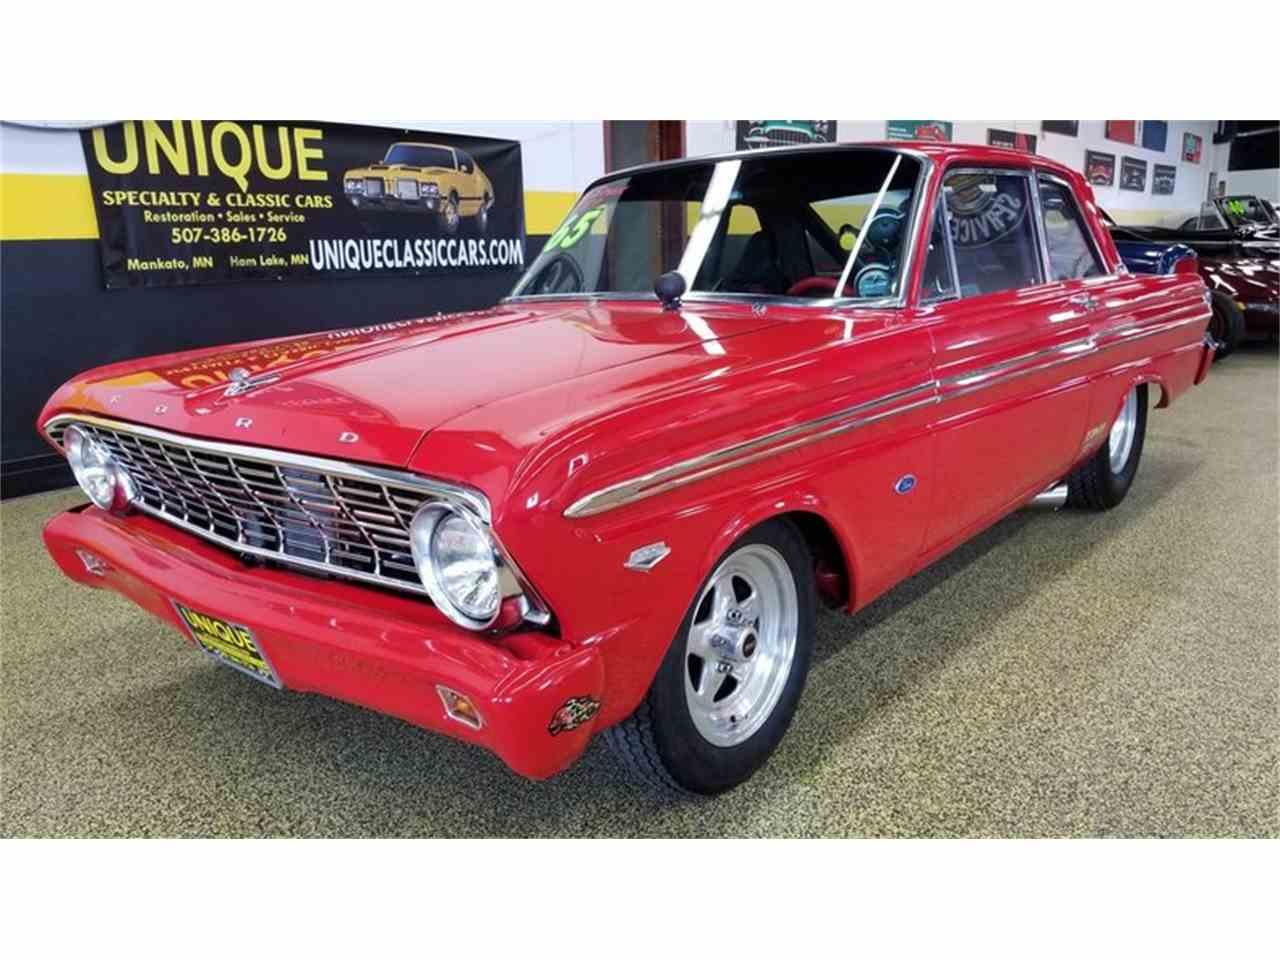 1965 Ford Falcon for Sale | ClassicCars.com | CC-1084052